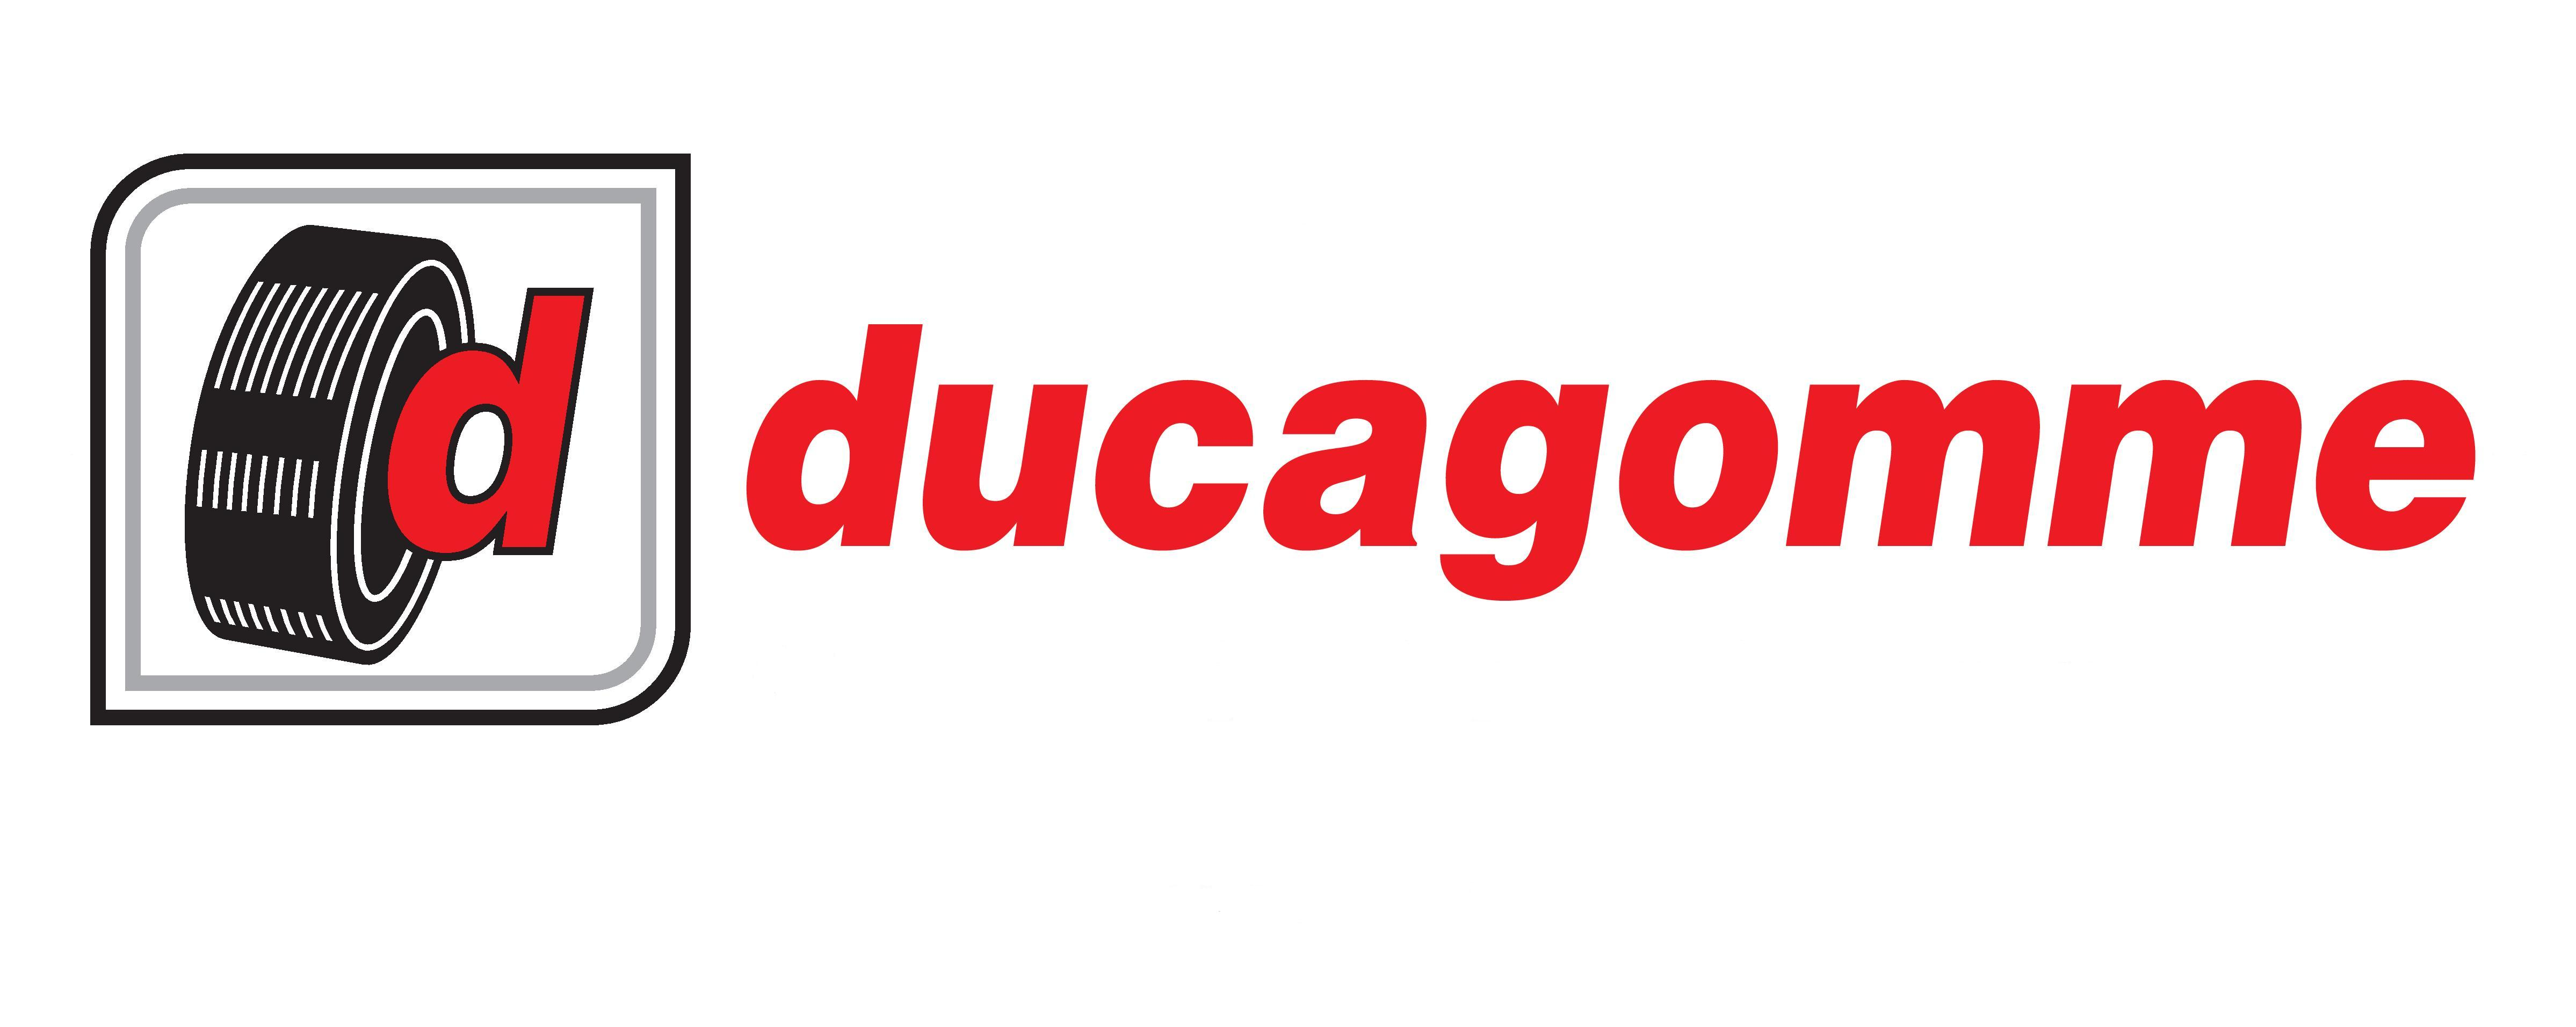 Duca Gomme (AN) cliente dal 1998